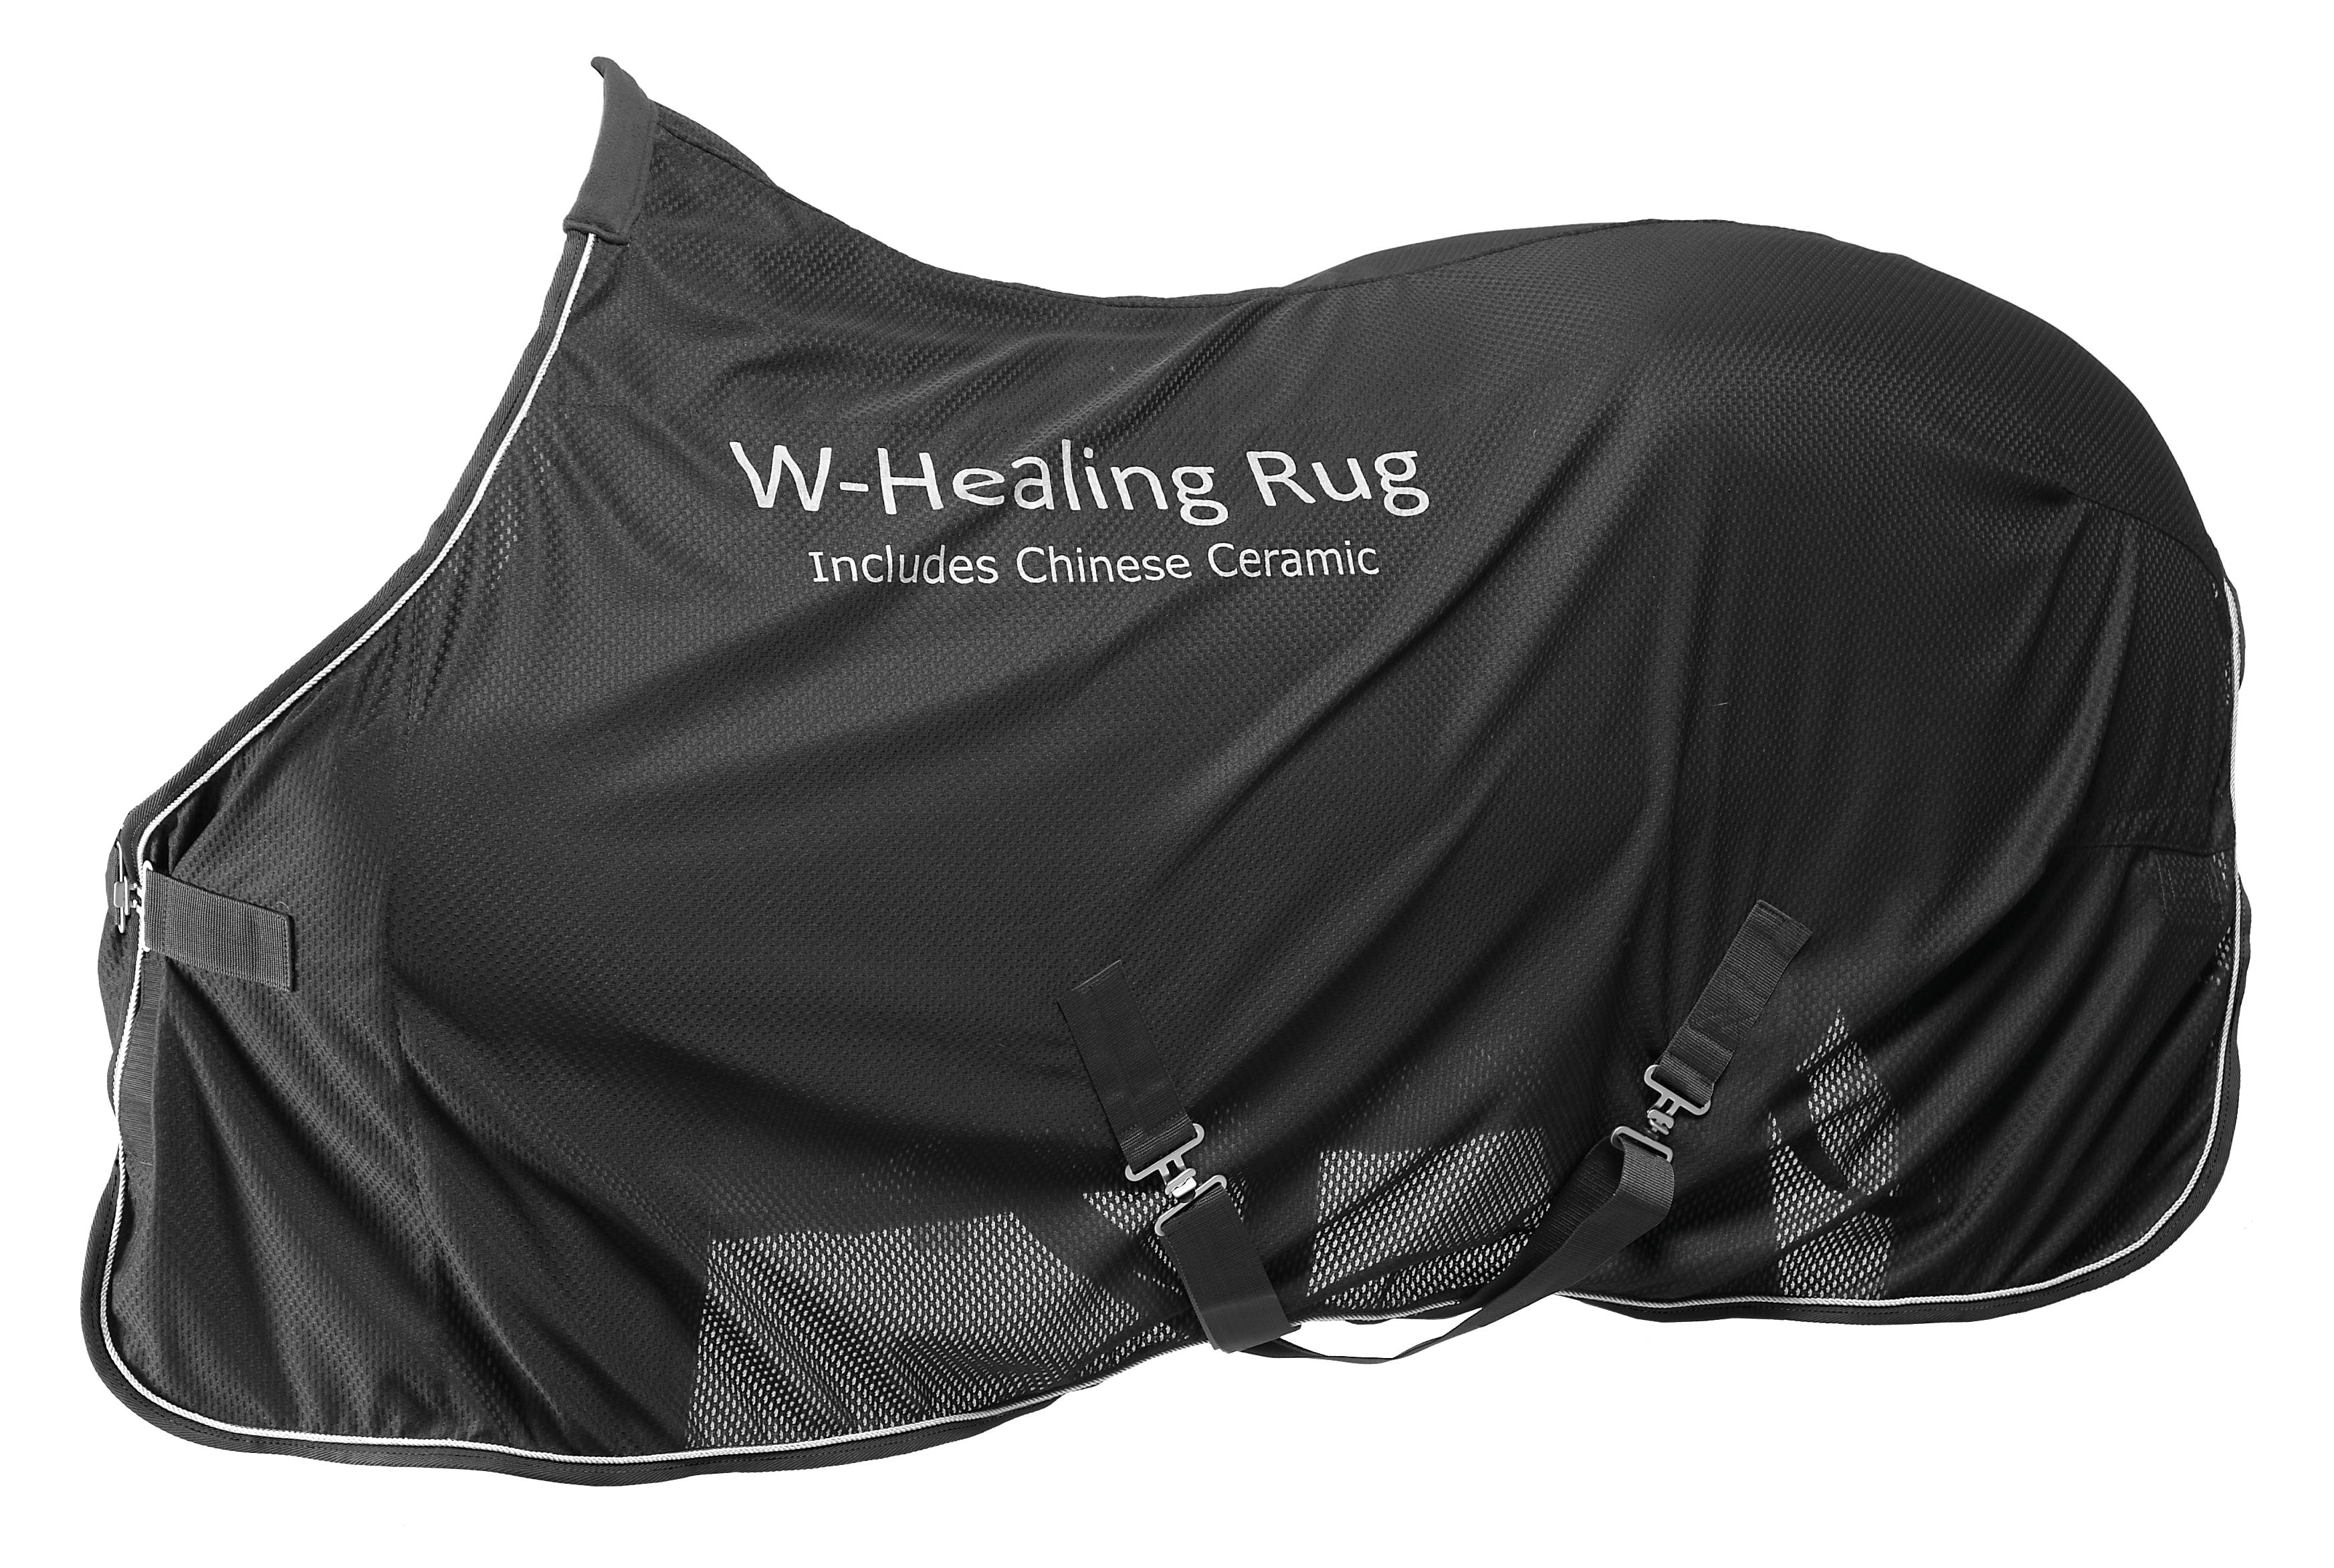 Wahlsten W-Healing dekken, størrelse 95-115